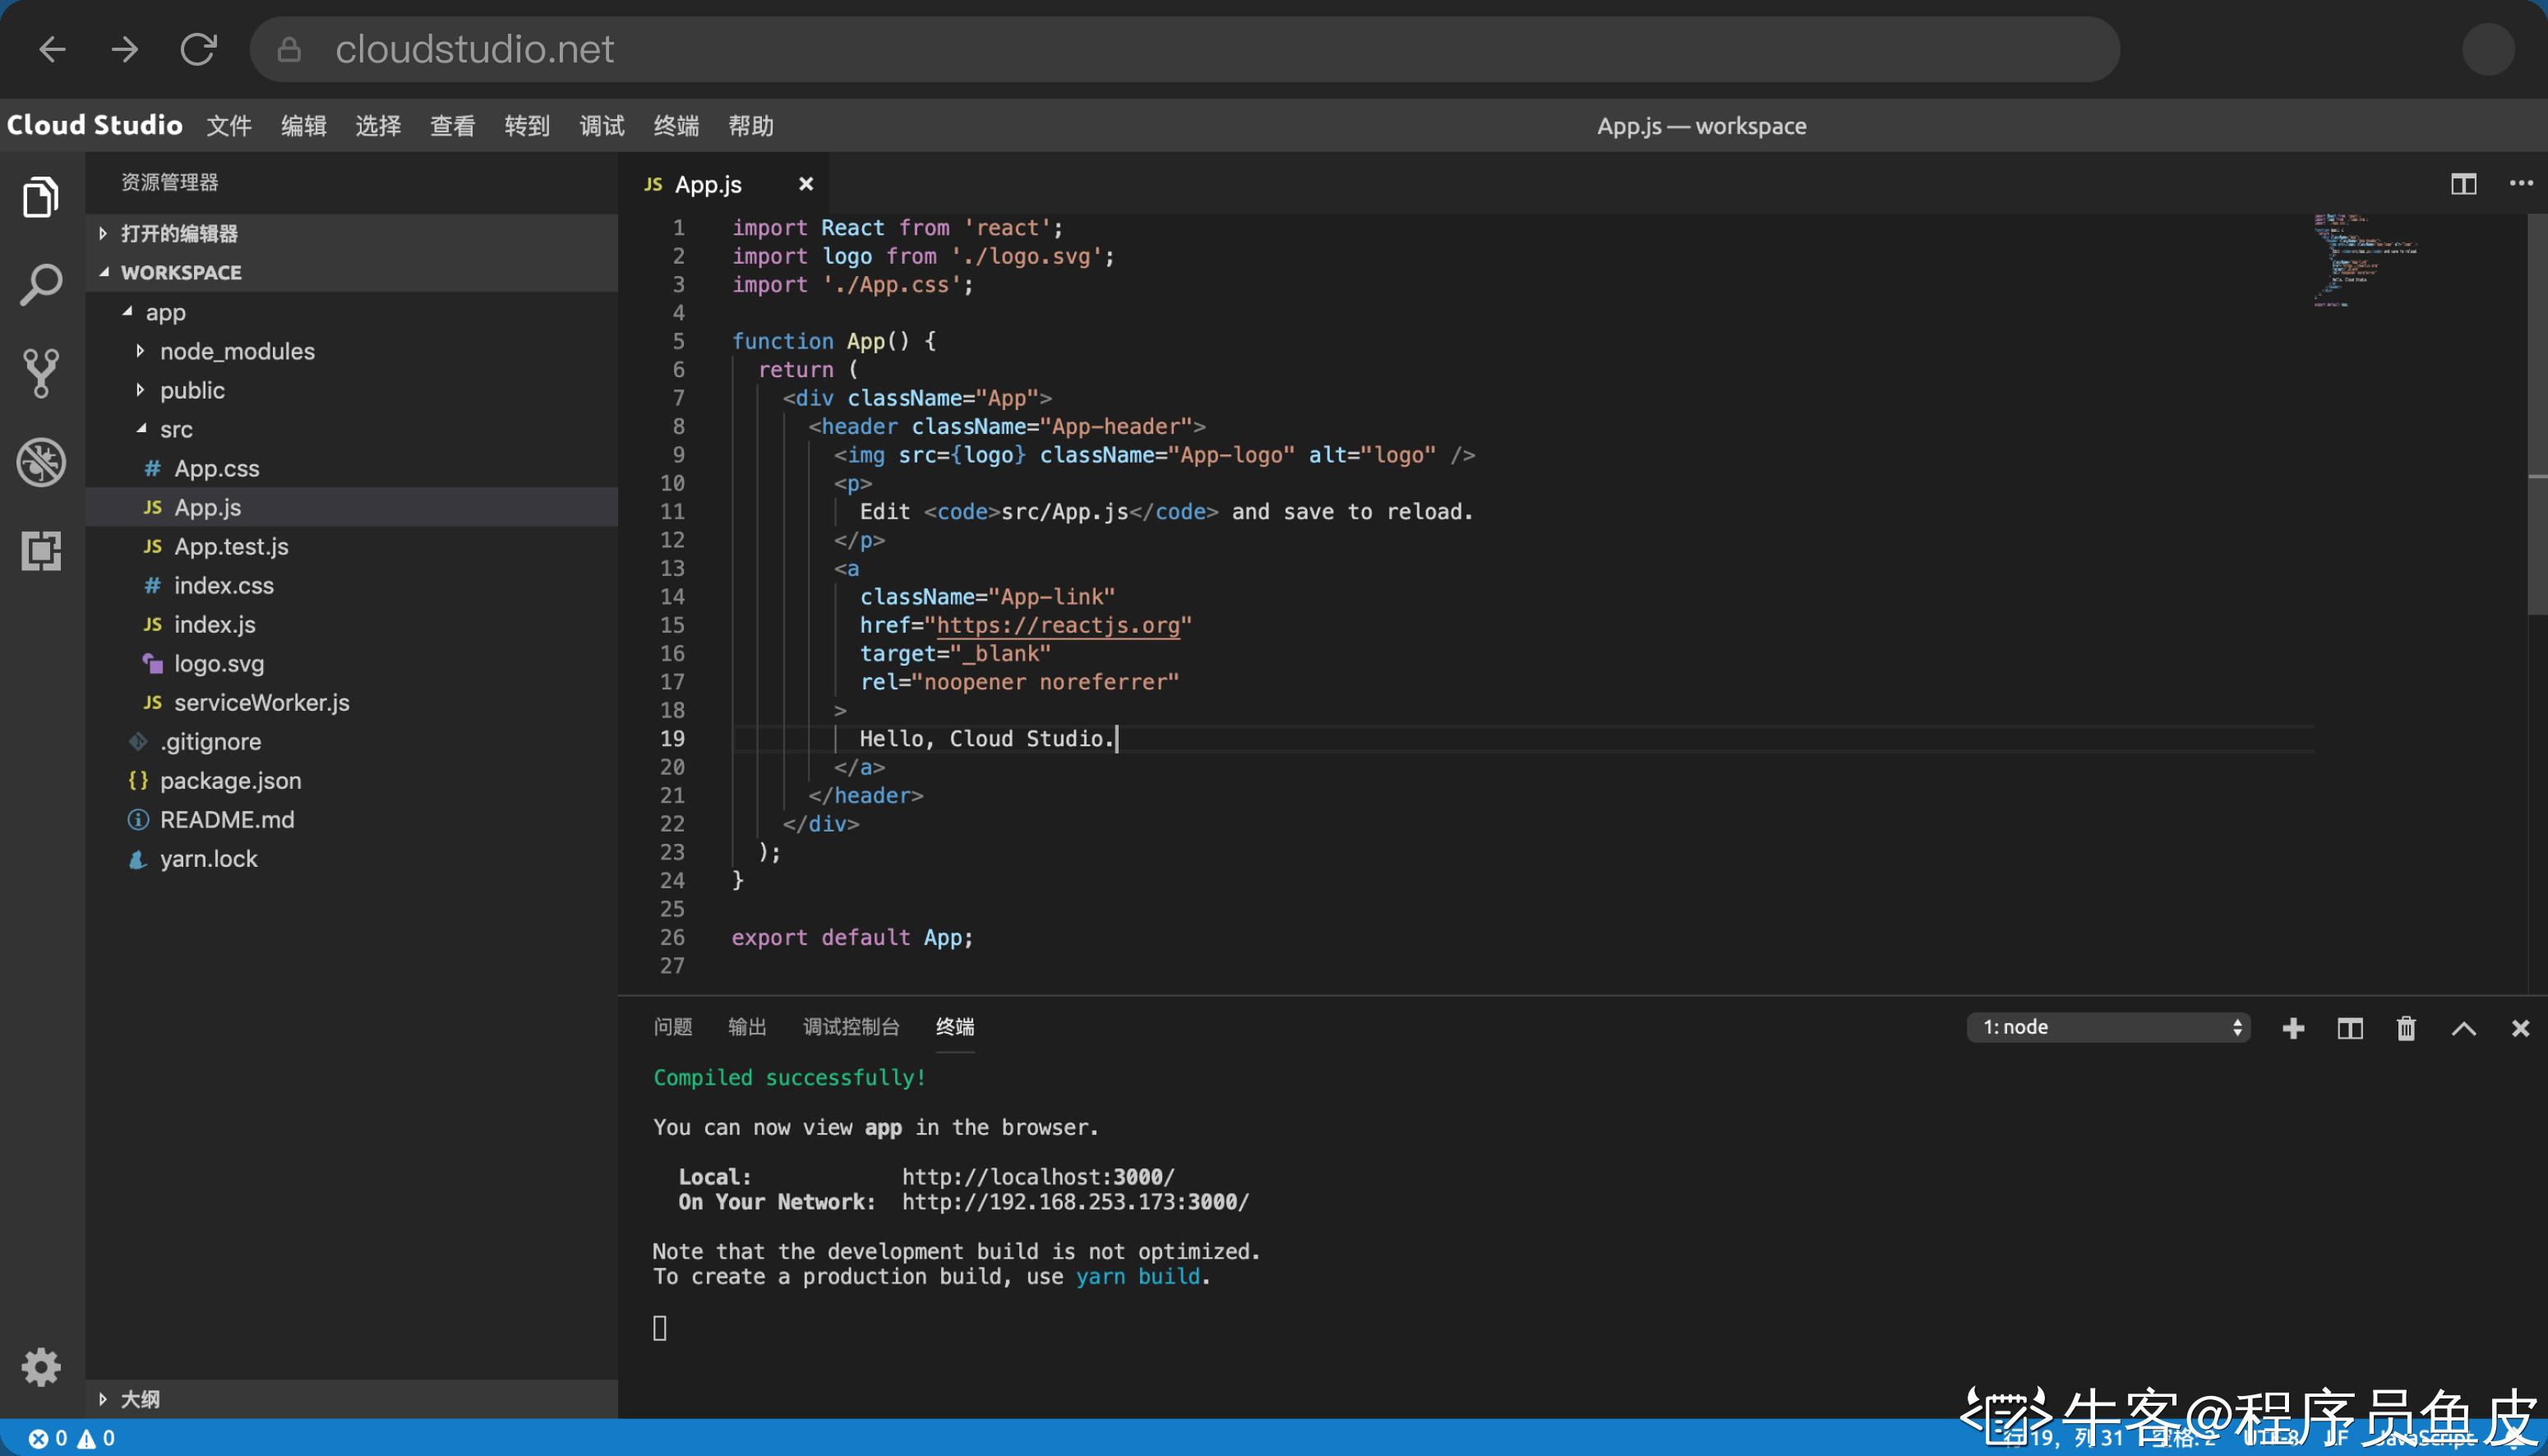 Cloud Studio 在线开发